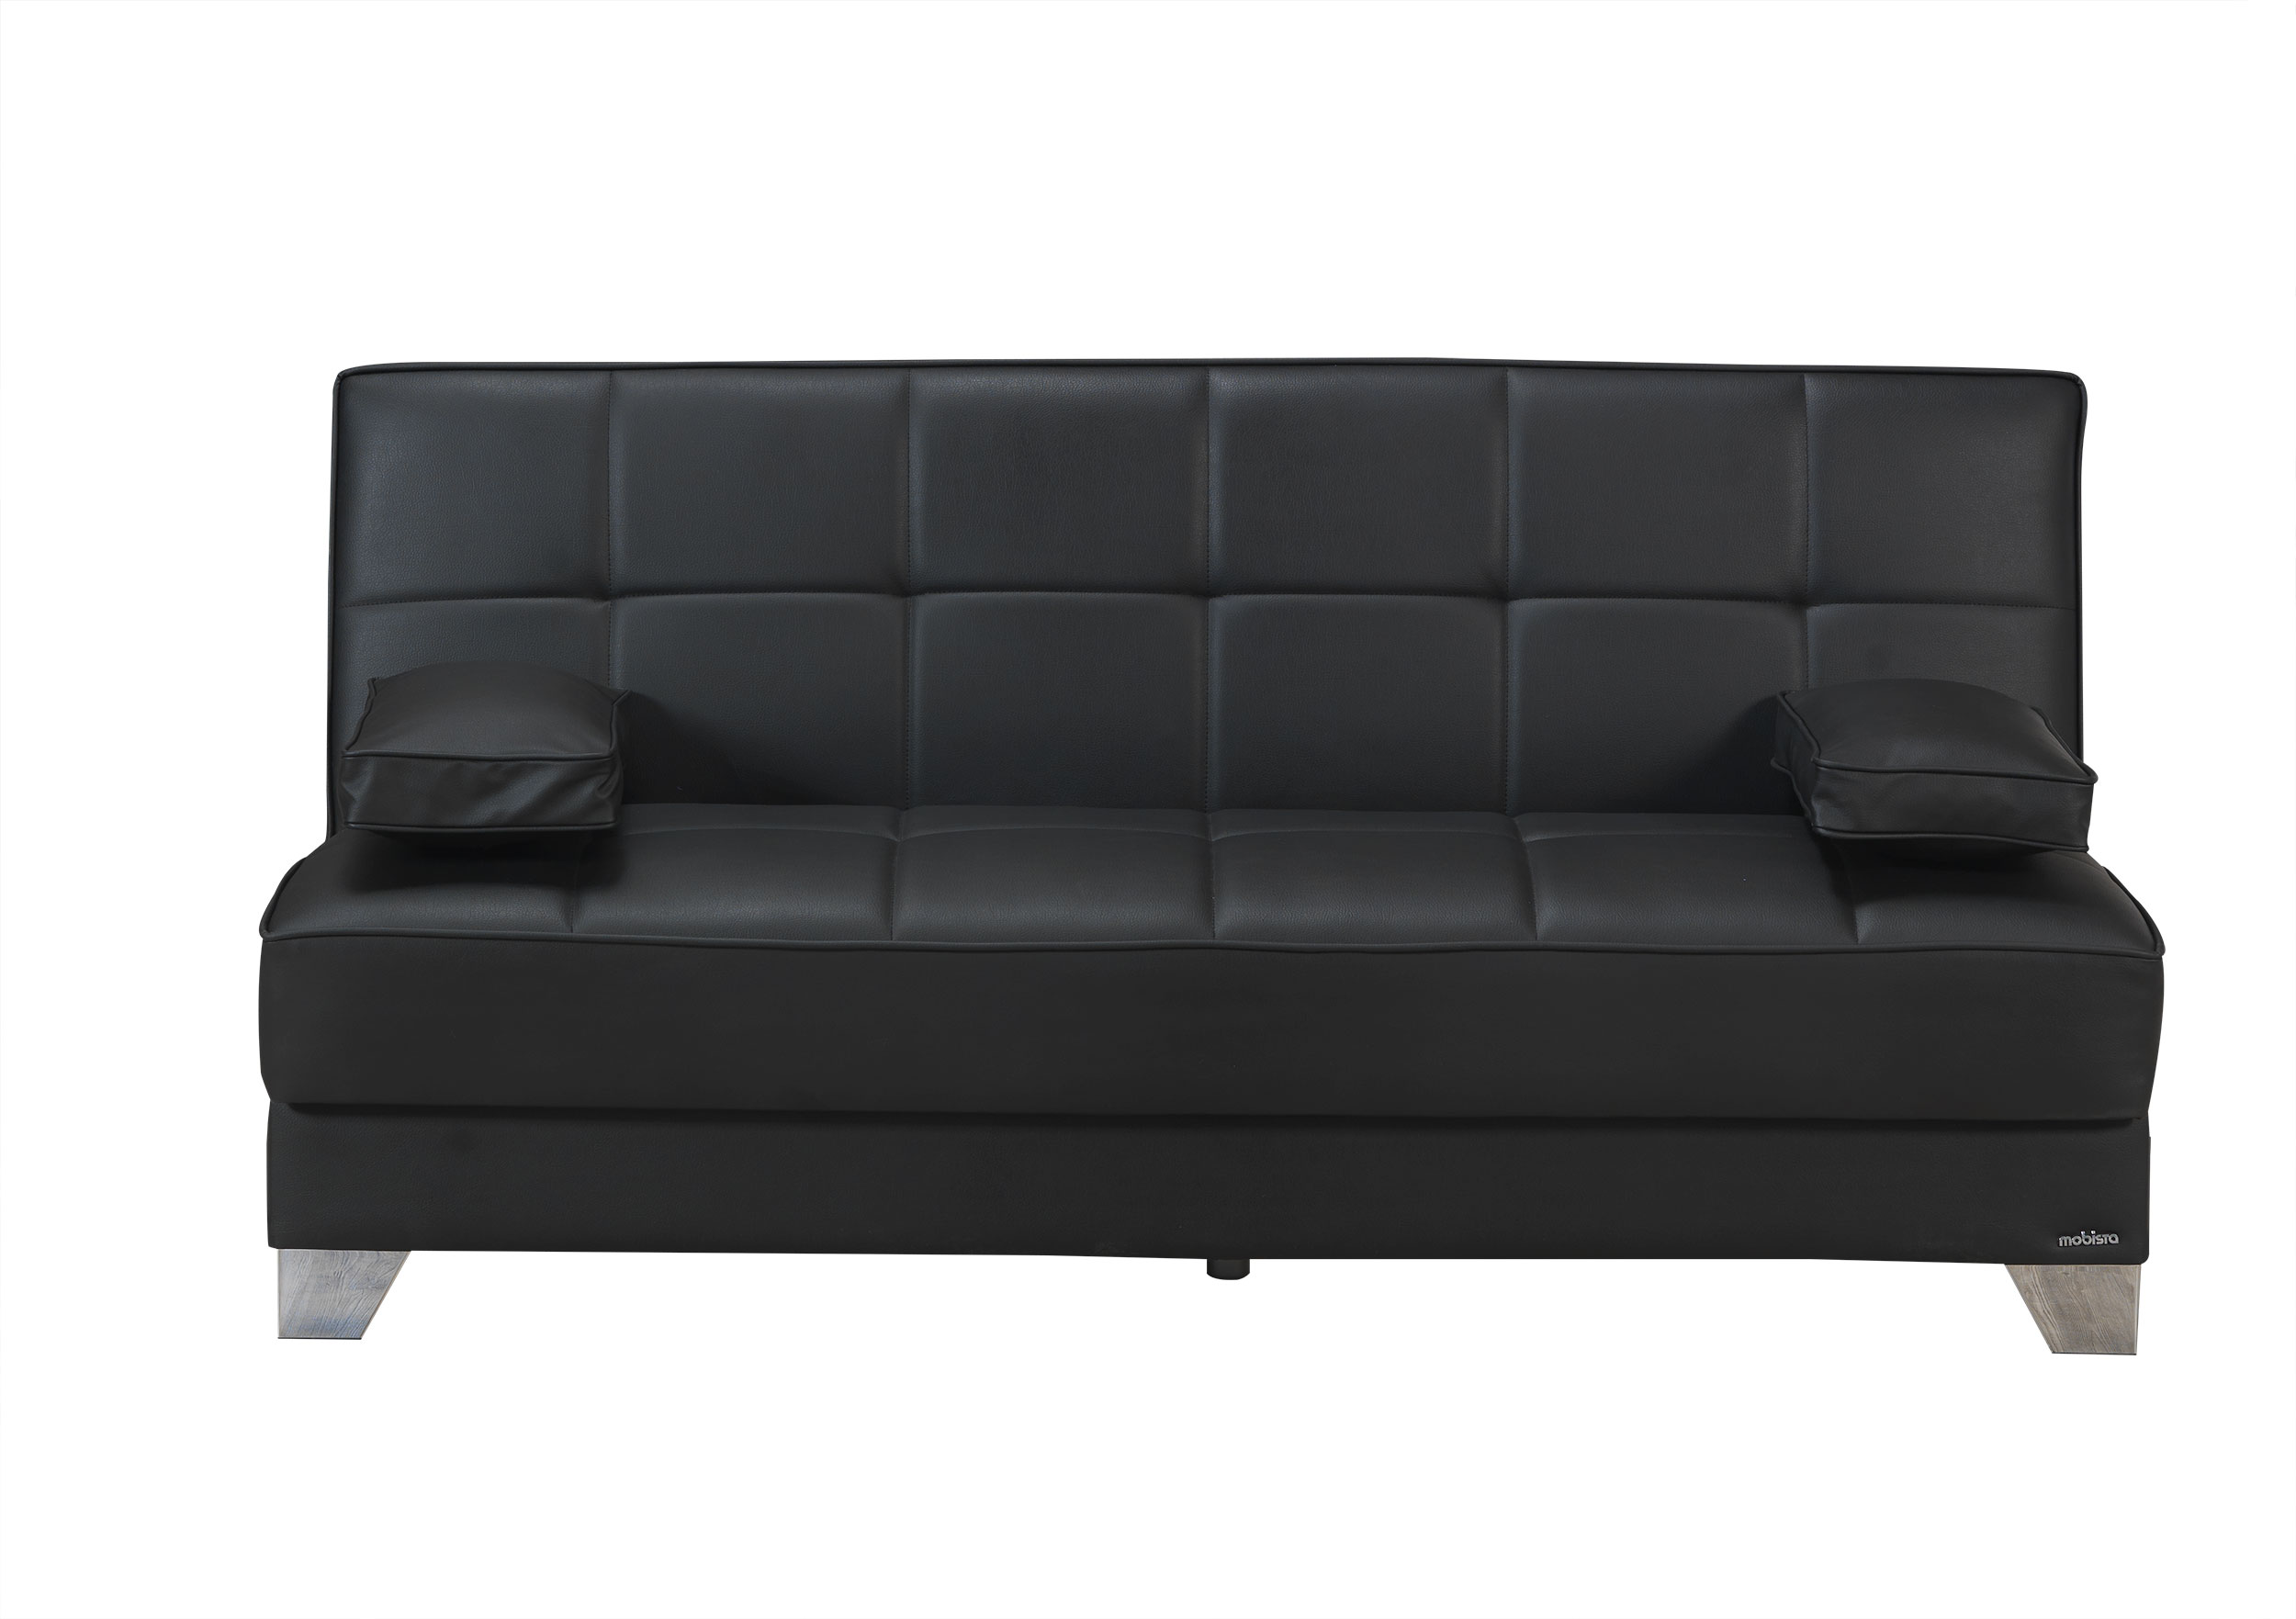 Tribeca Nyc Prestige Black Sofa Bed by Mobista